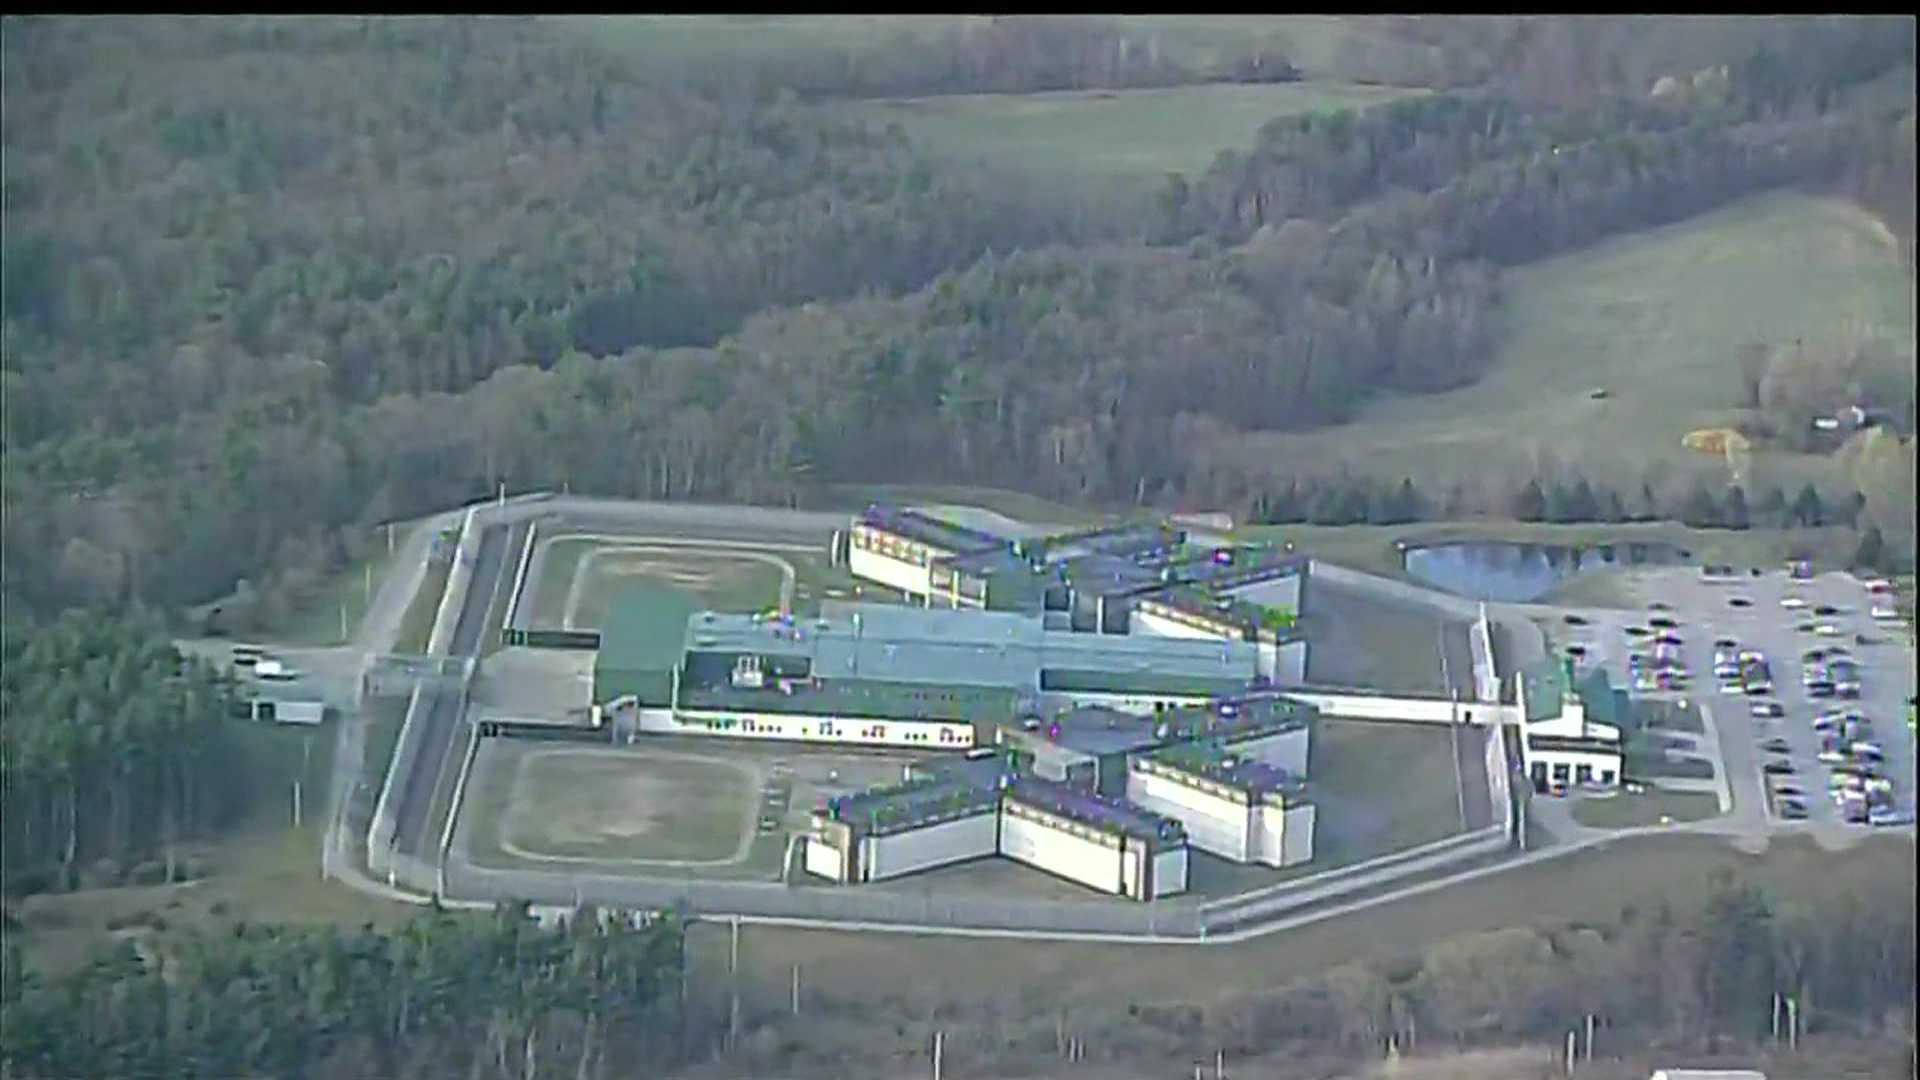 Souza Baranowski Correctional Facility